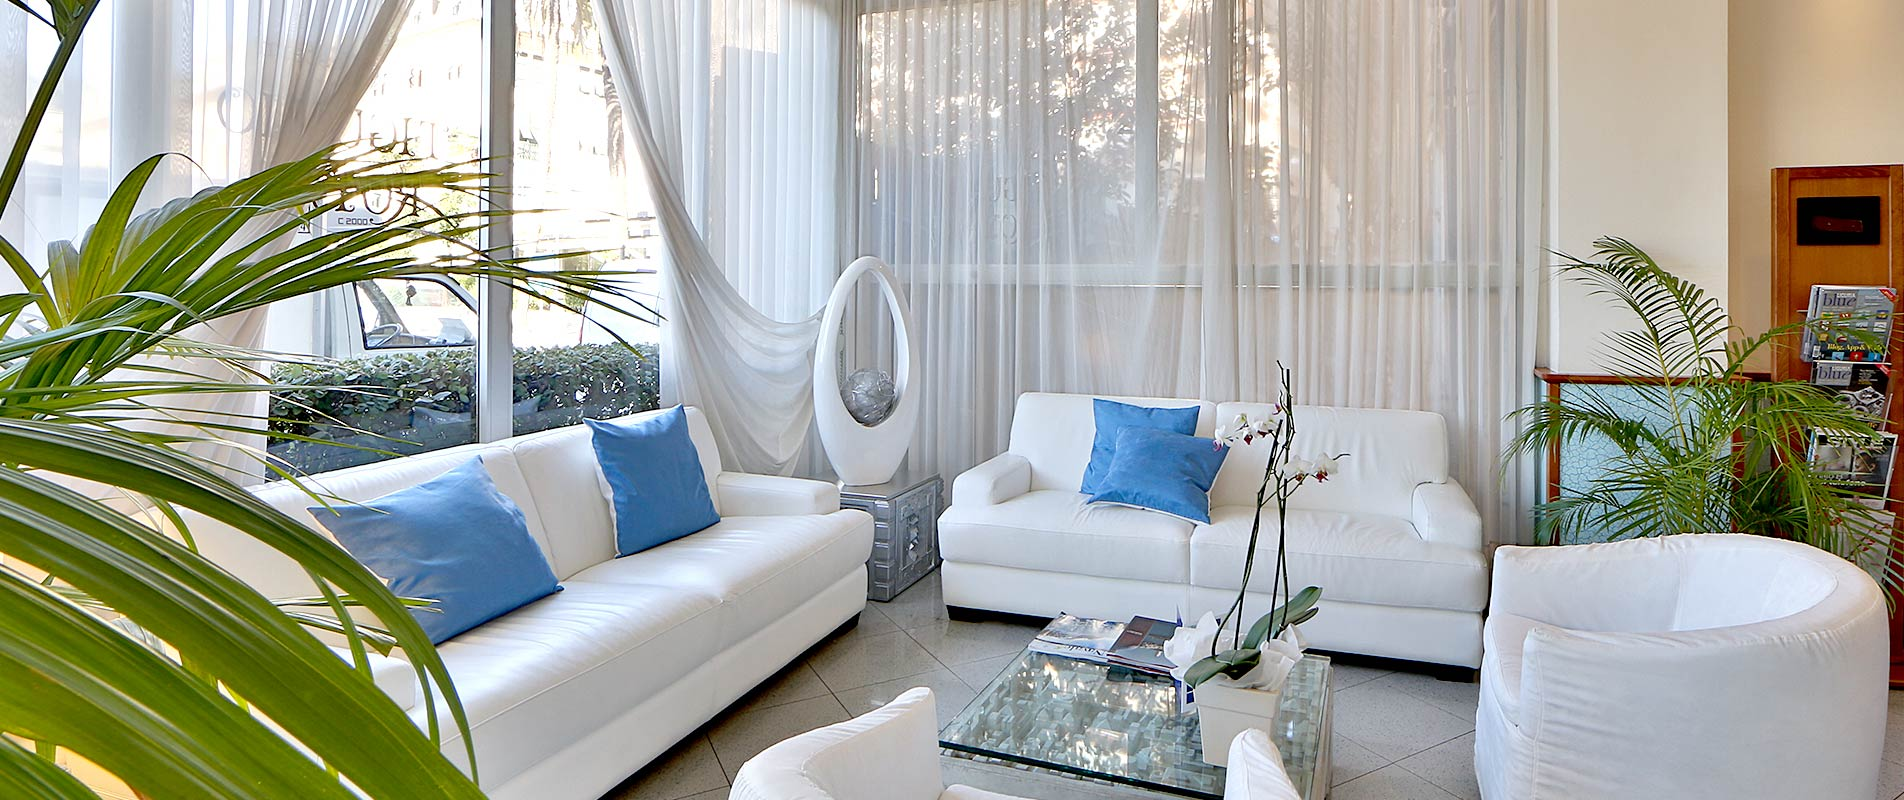 Hotel Rapallo - Hotel Tigullio Royal 4 stelle